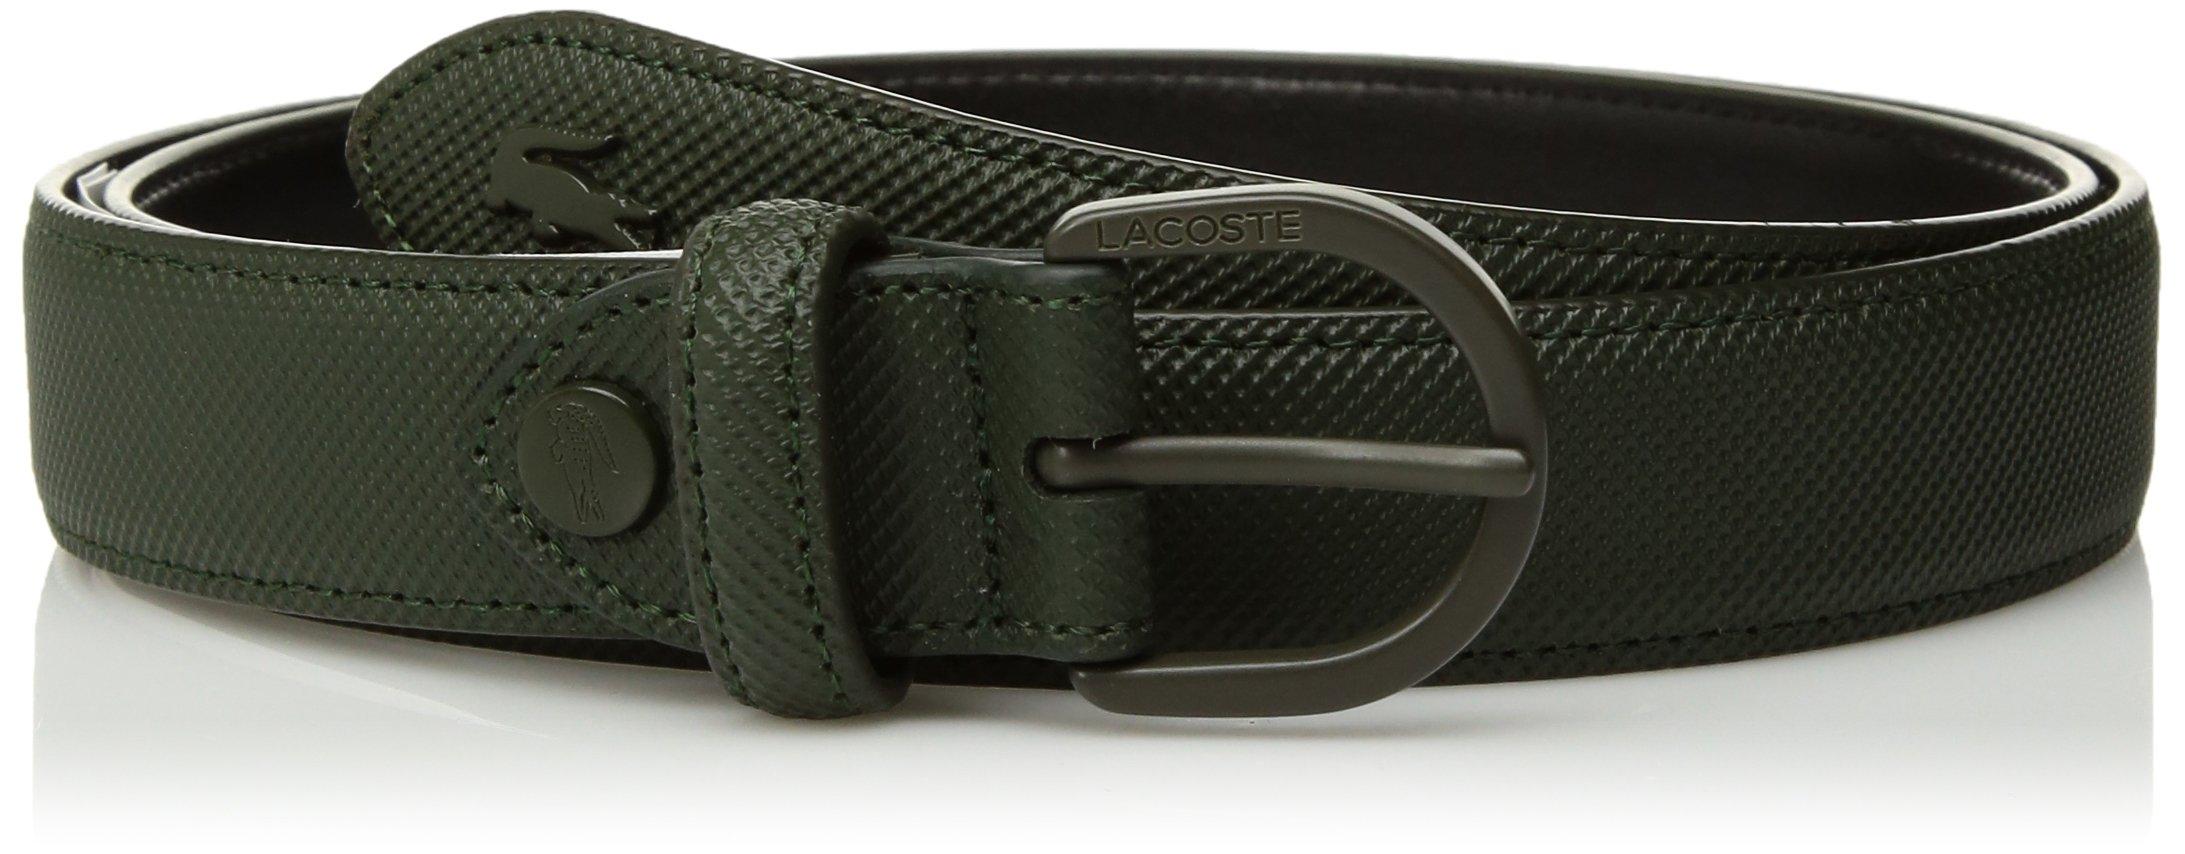 Lacoste Women's Reversible Pique Belt, Rosin, 35 in